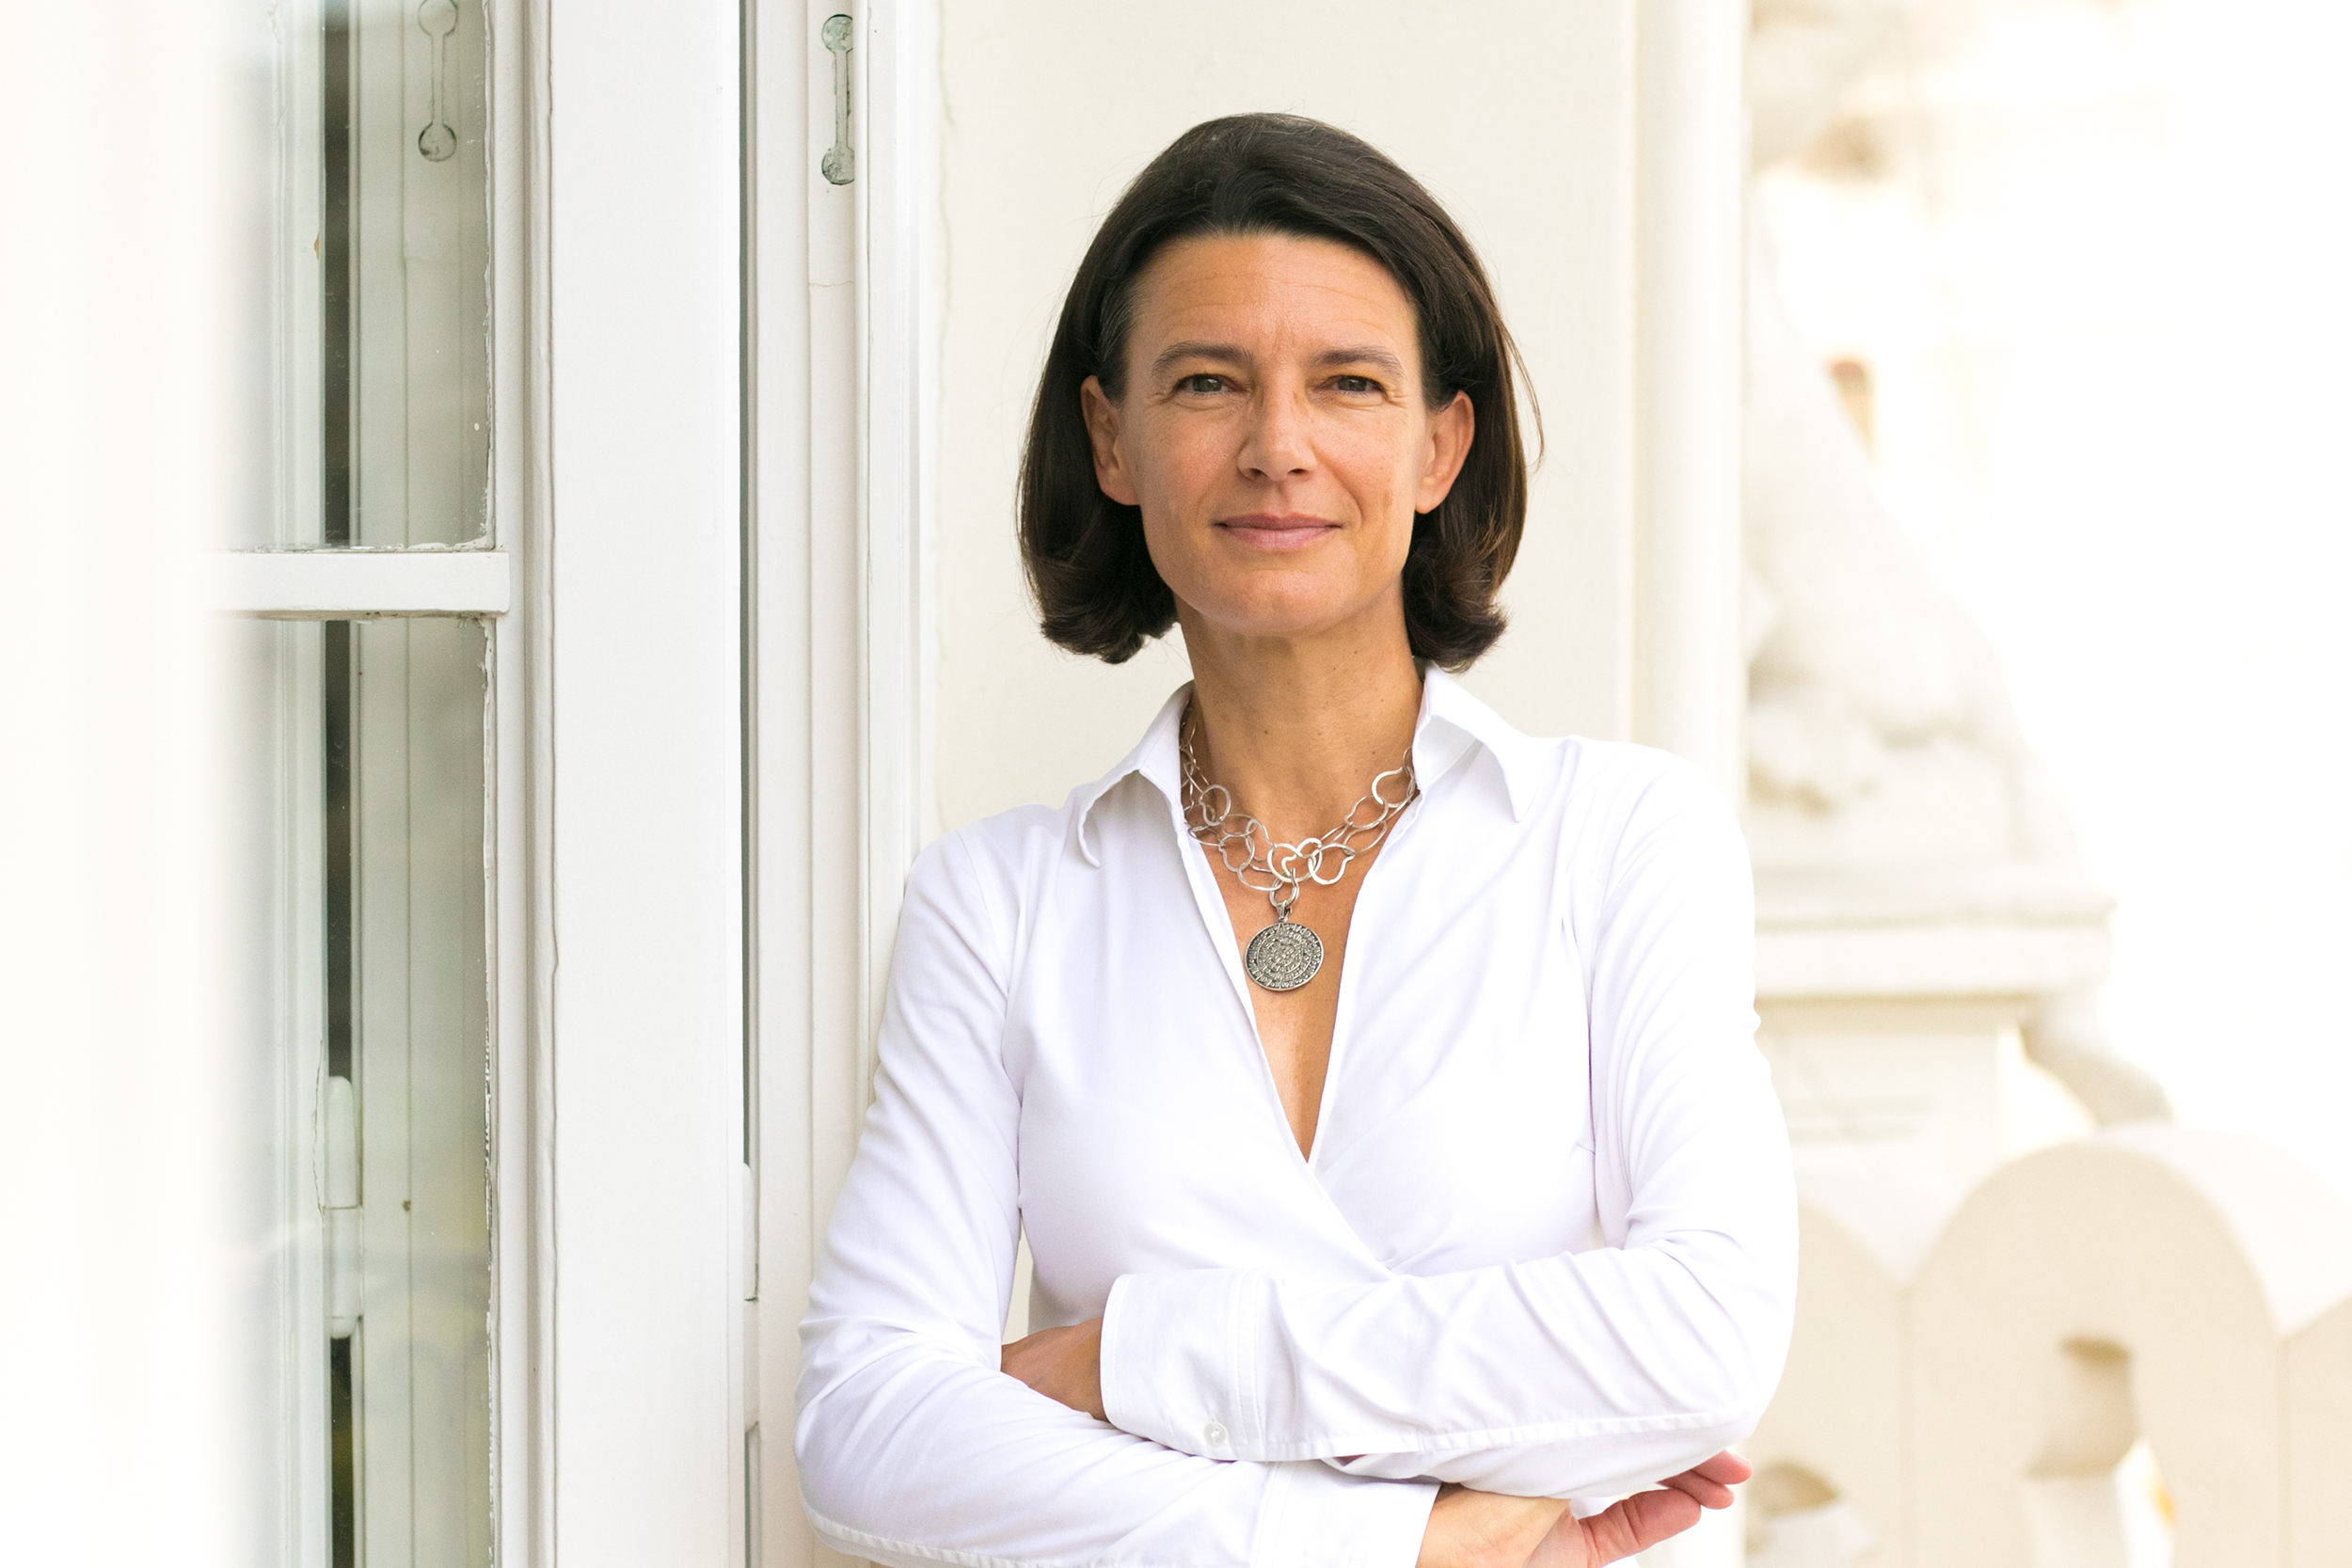 Mag. Elisabeth Stockhammer